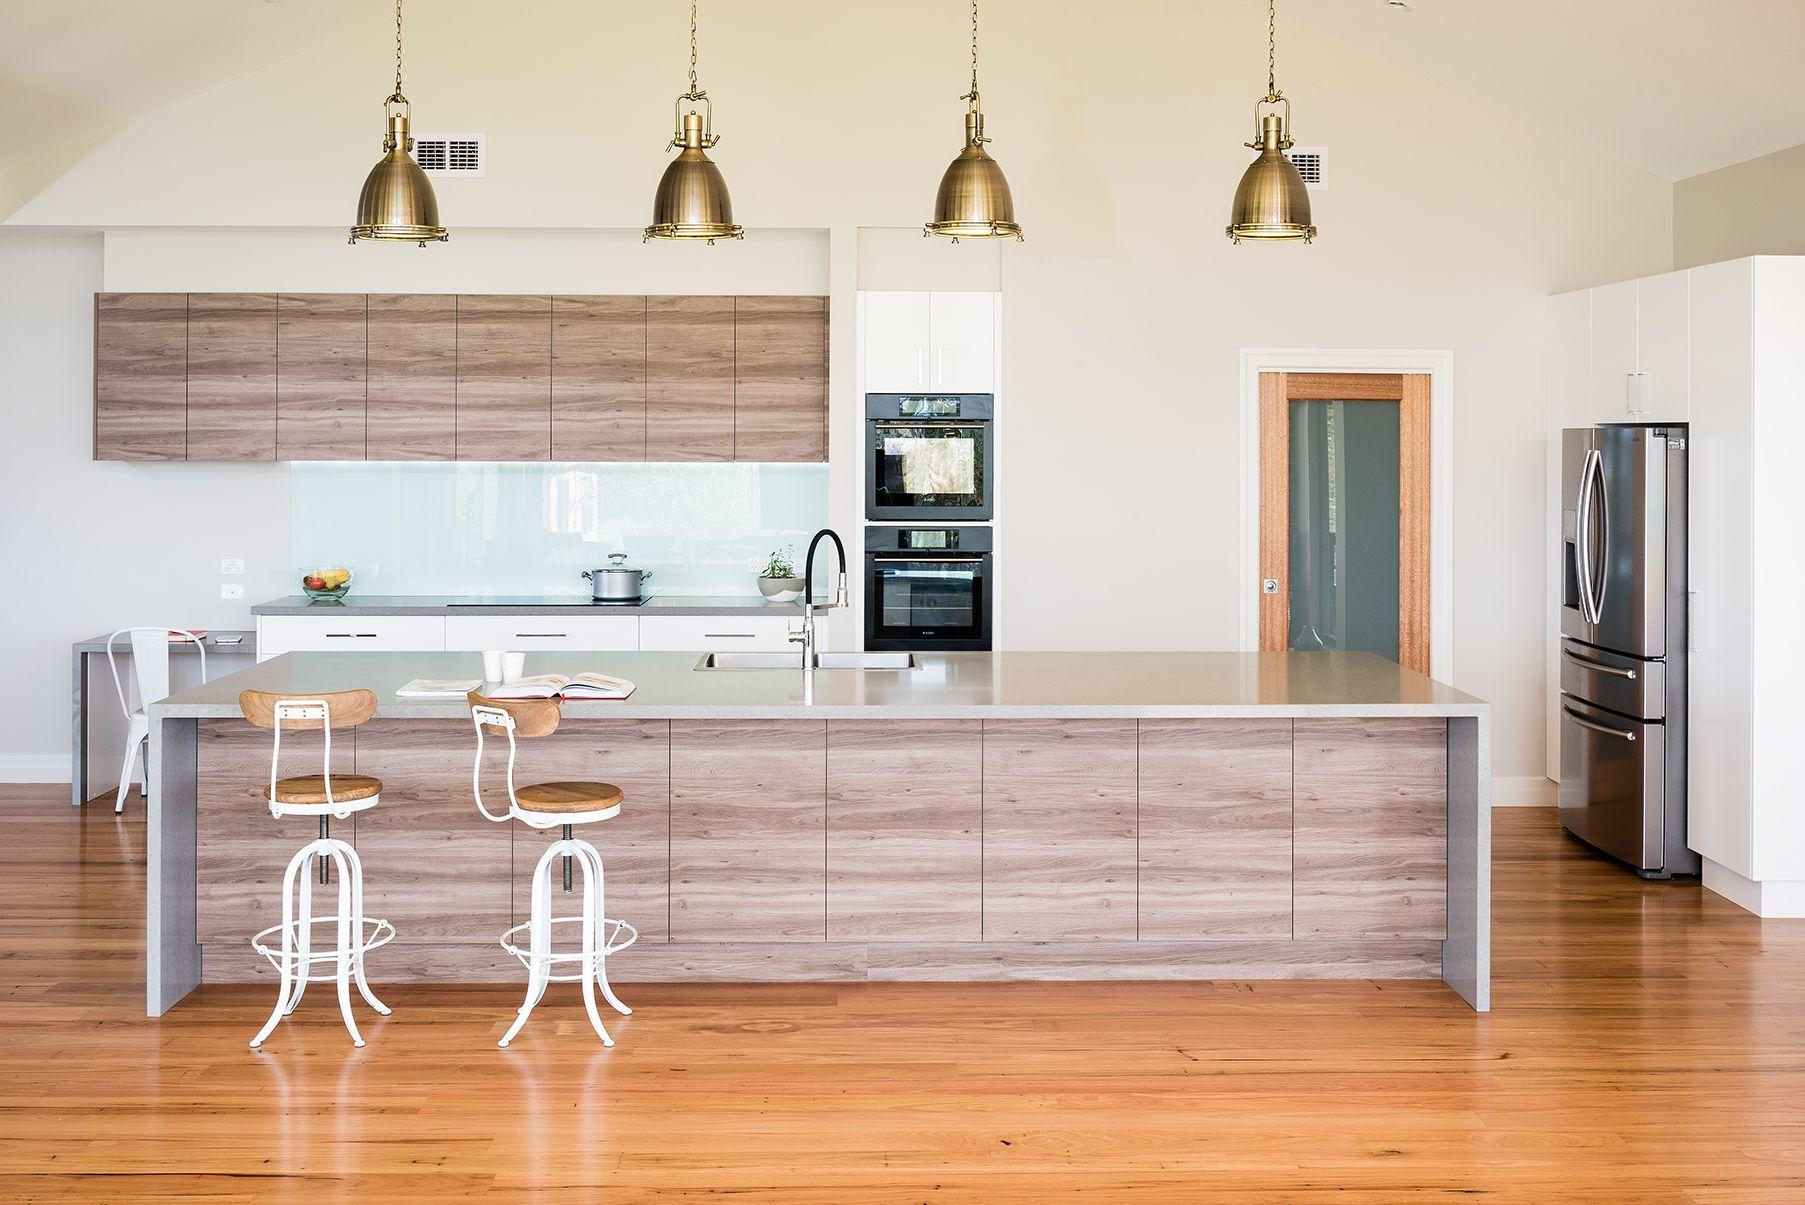 Current Trends In Kitchen Design Adorable Now Showing Current Kitchen Design Trends Are All About Textured Design Ideas